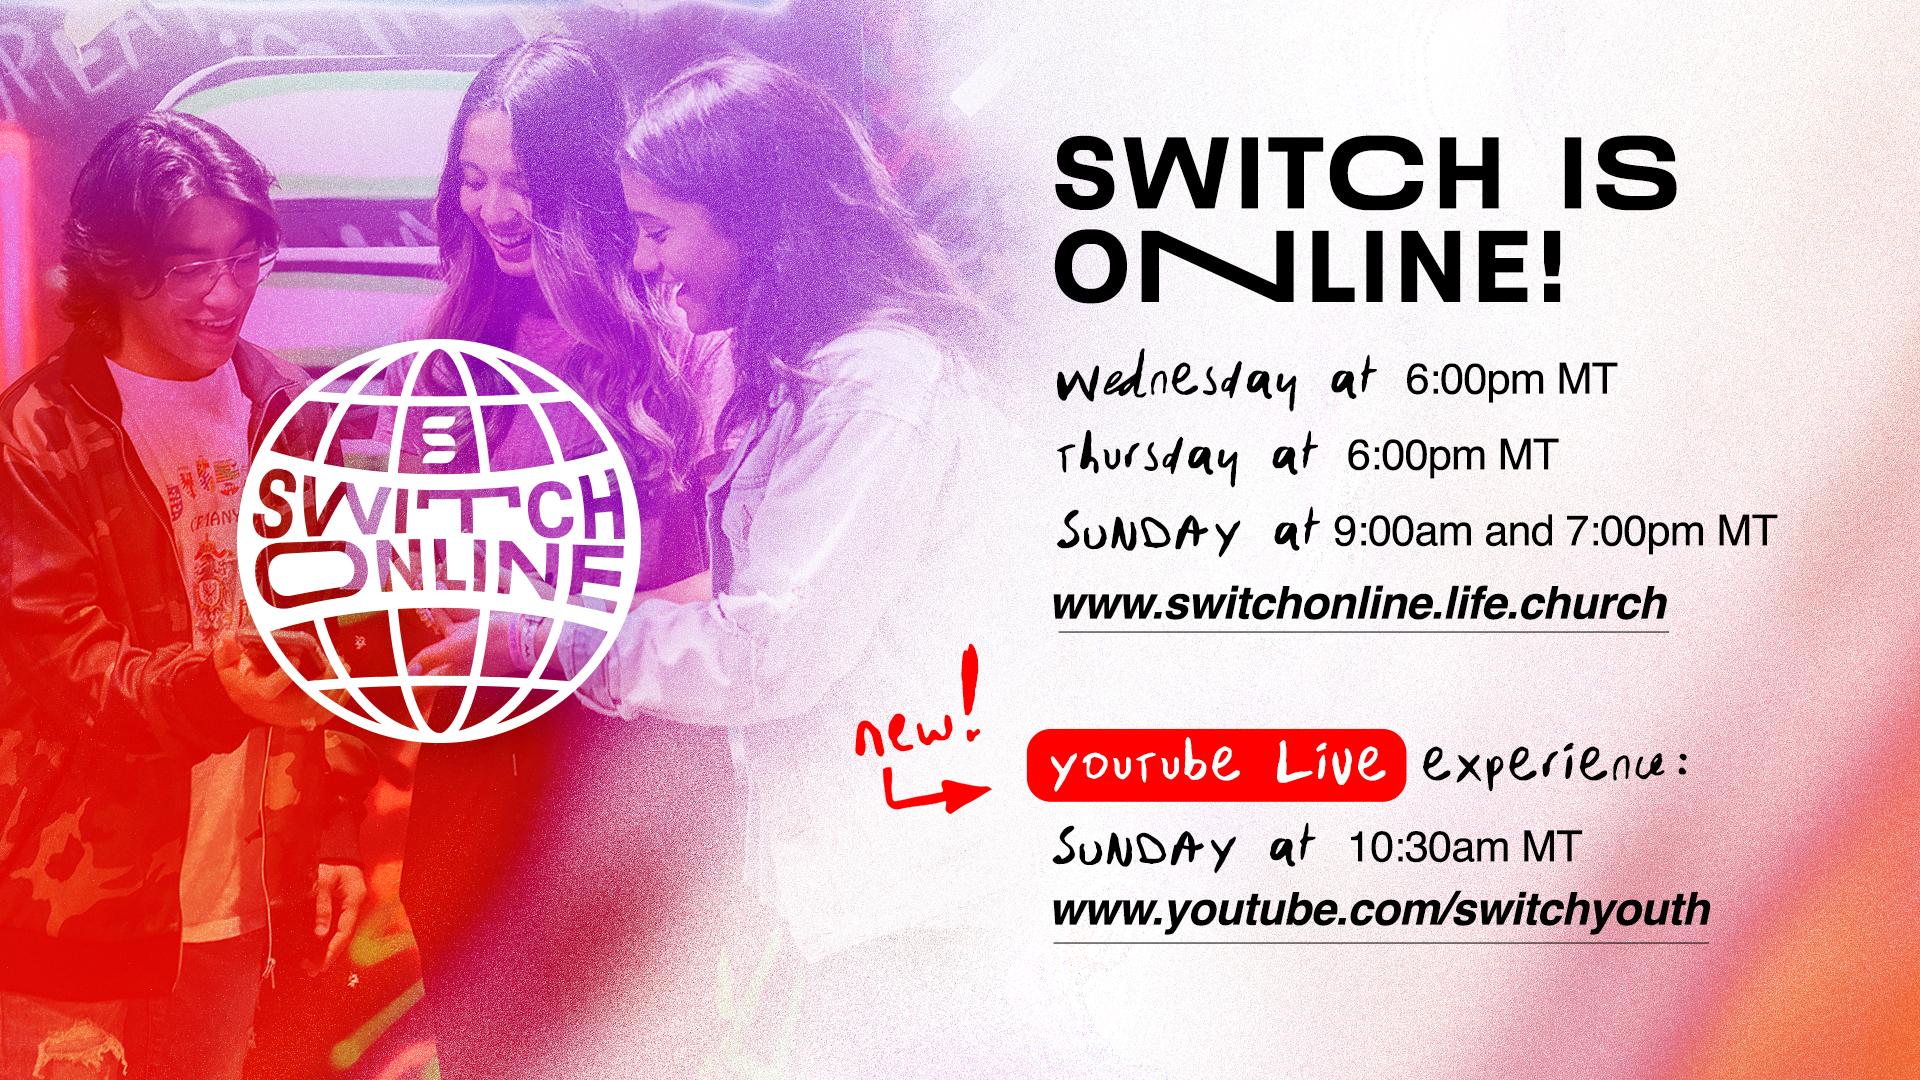 Switch Online Times 1080 - MT 2 (JPG)